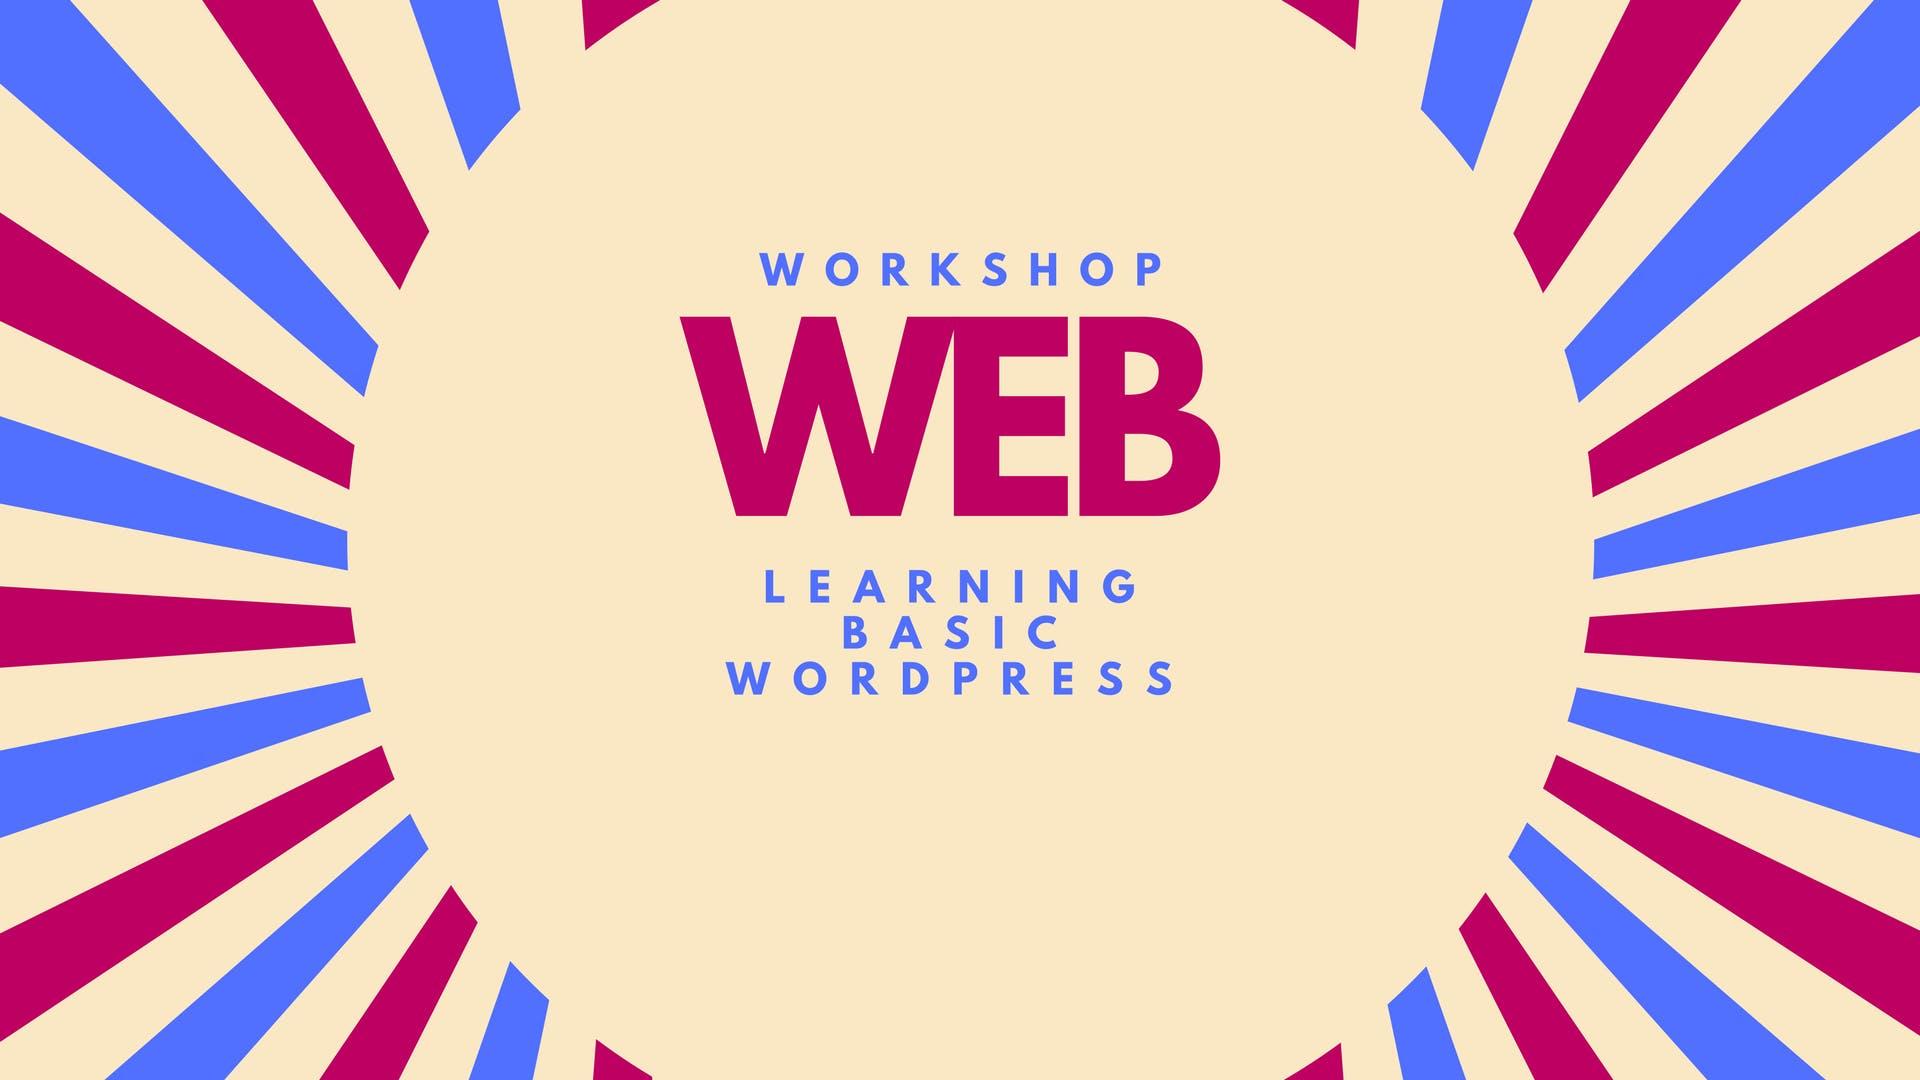 Introduction to Website building - Wordpress